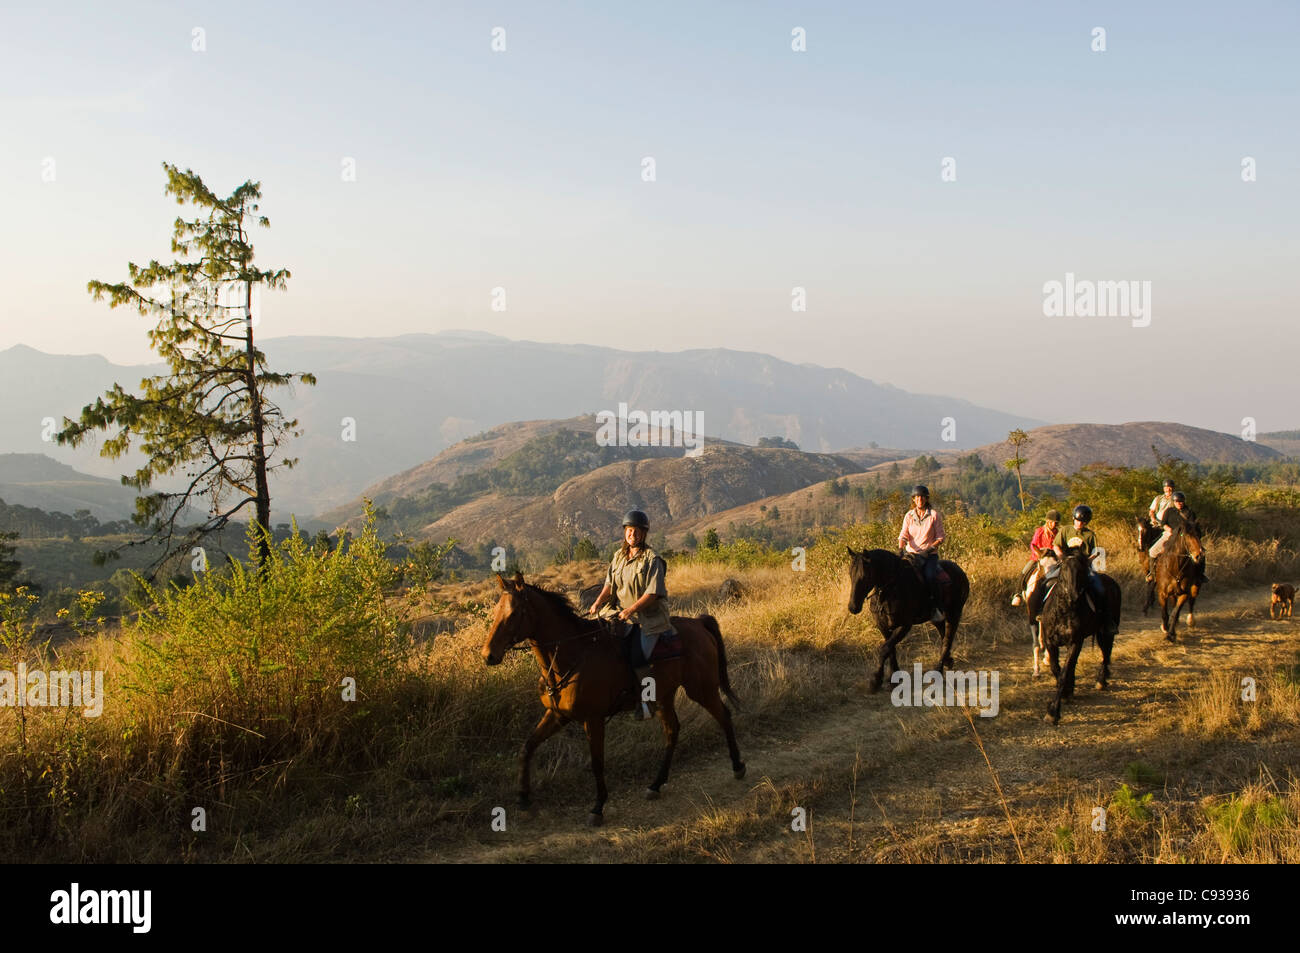 Malawi, Zomba Plateau.  A horse riding safari is a popular way to explore Zomba Plateau. - Stock Image